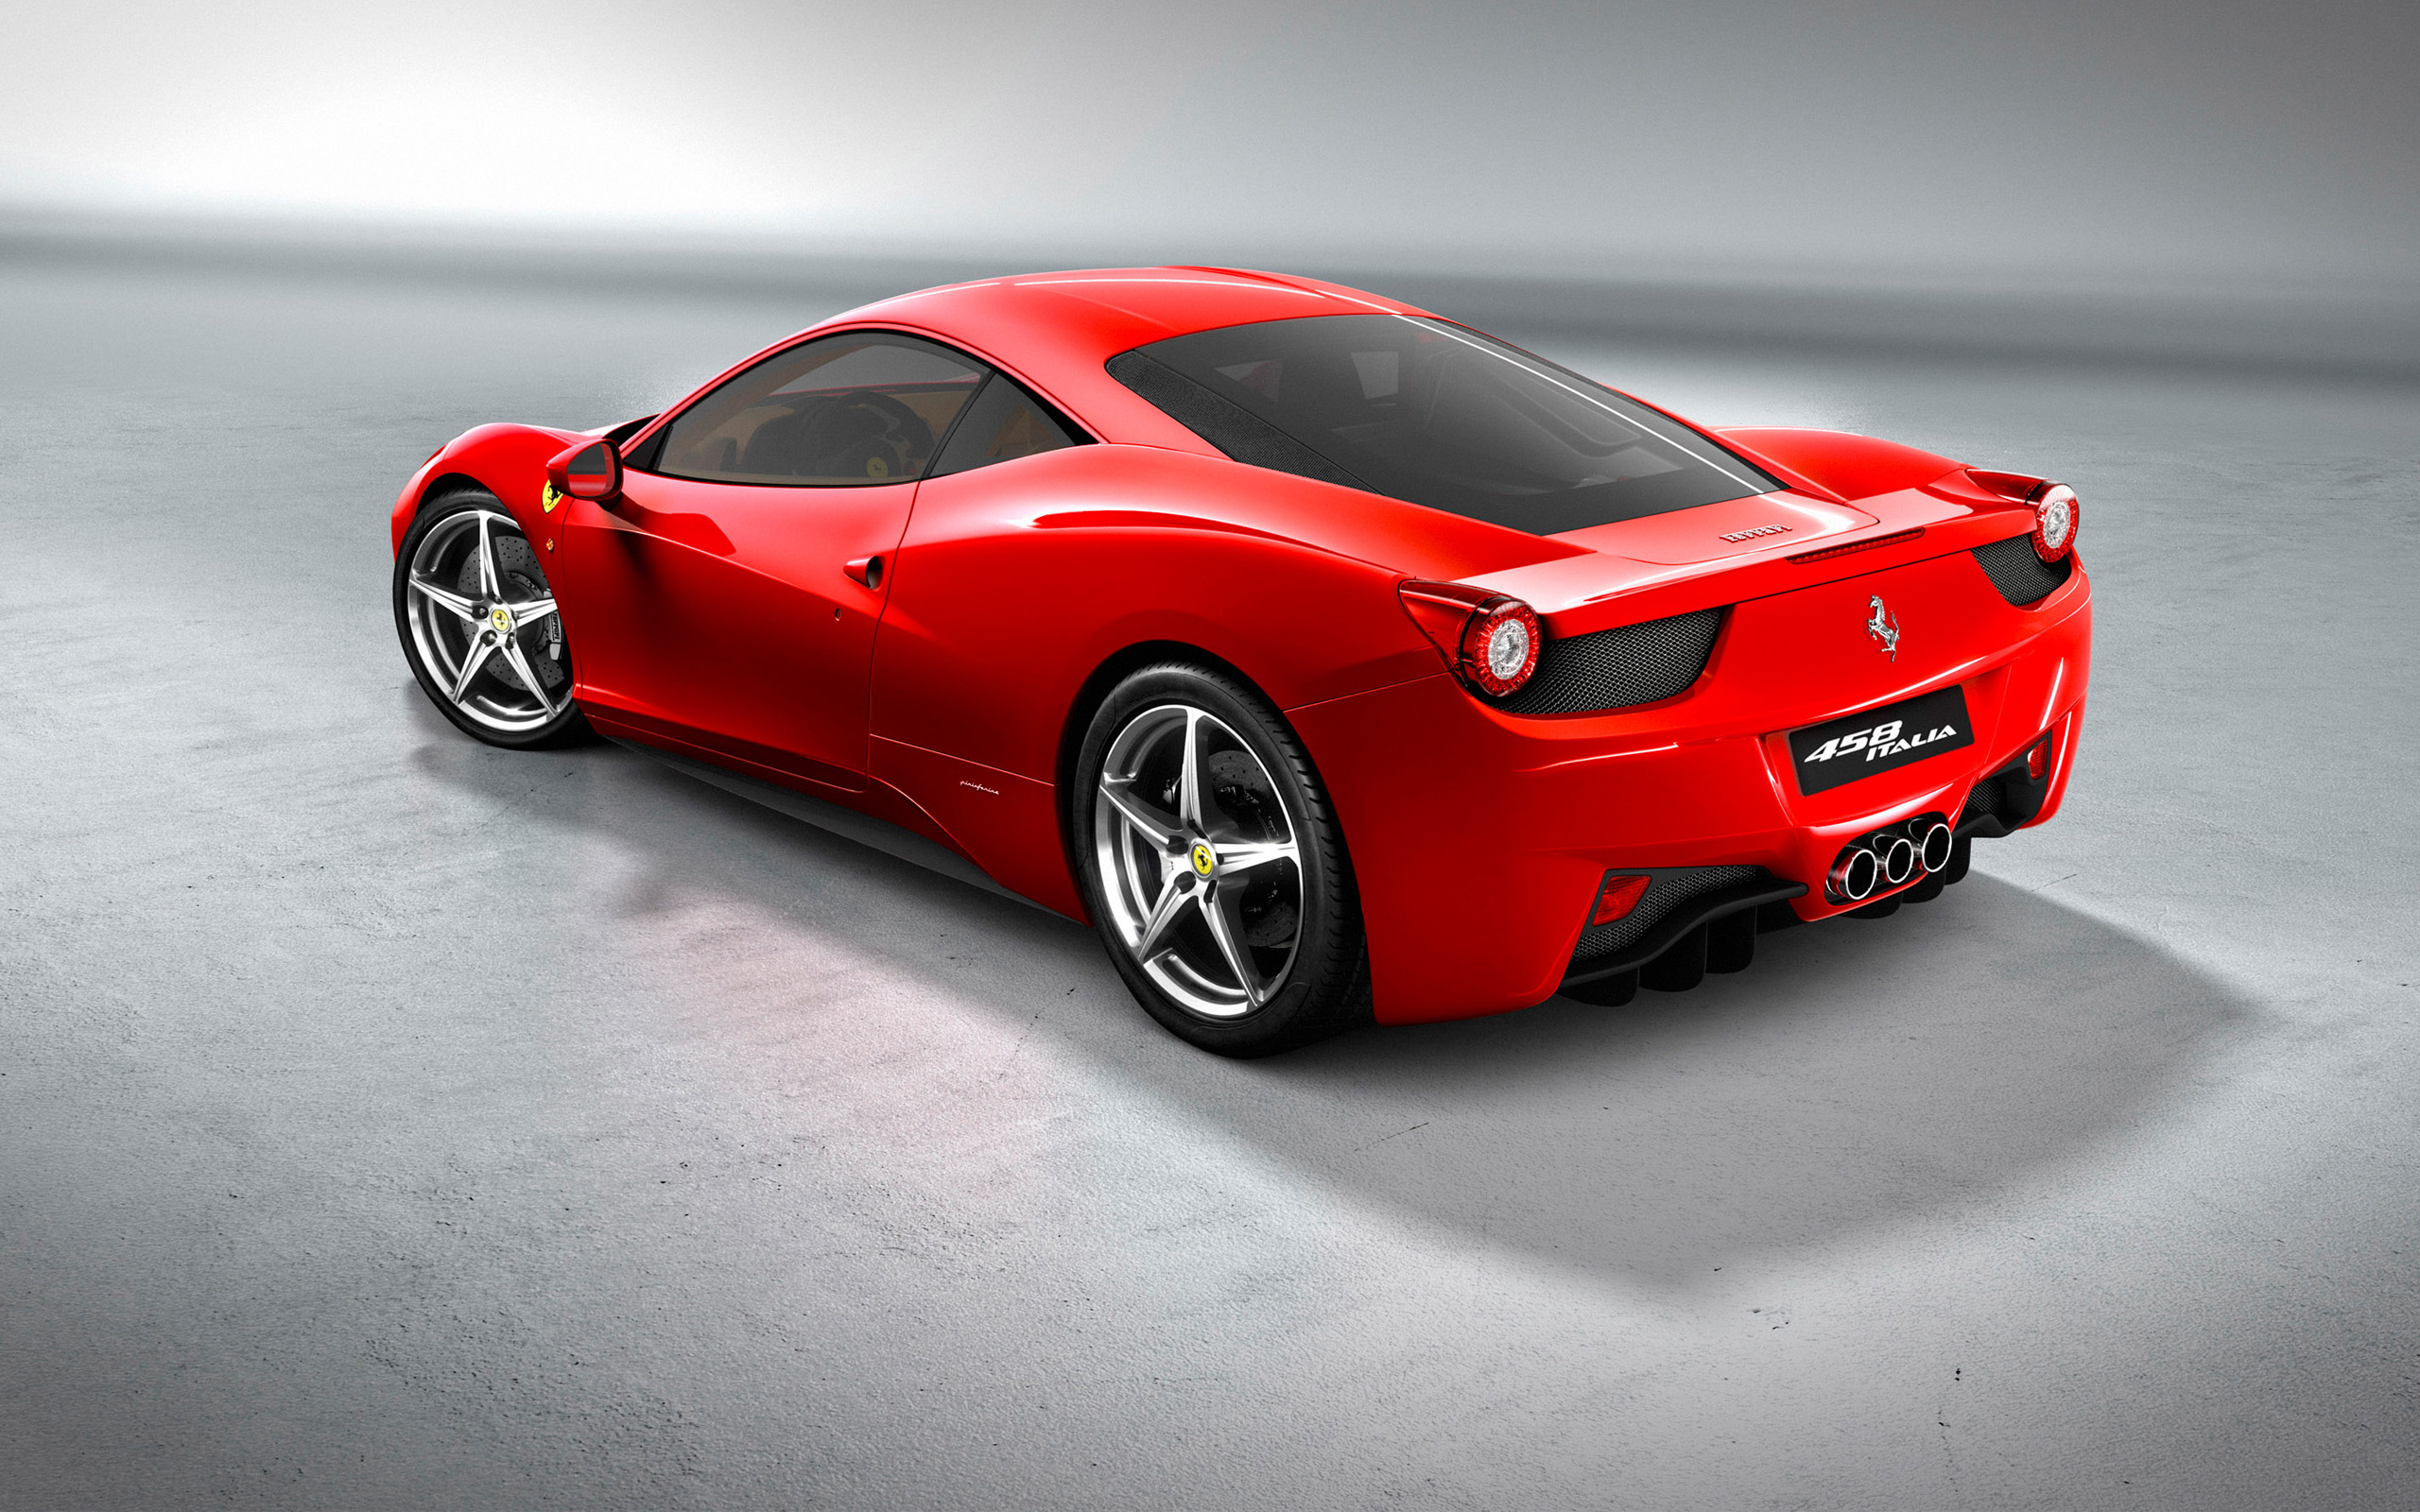 Download Red Ferrari Car Wallpaper 45128 2560x1600 Px High